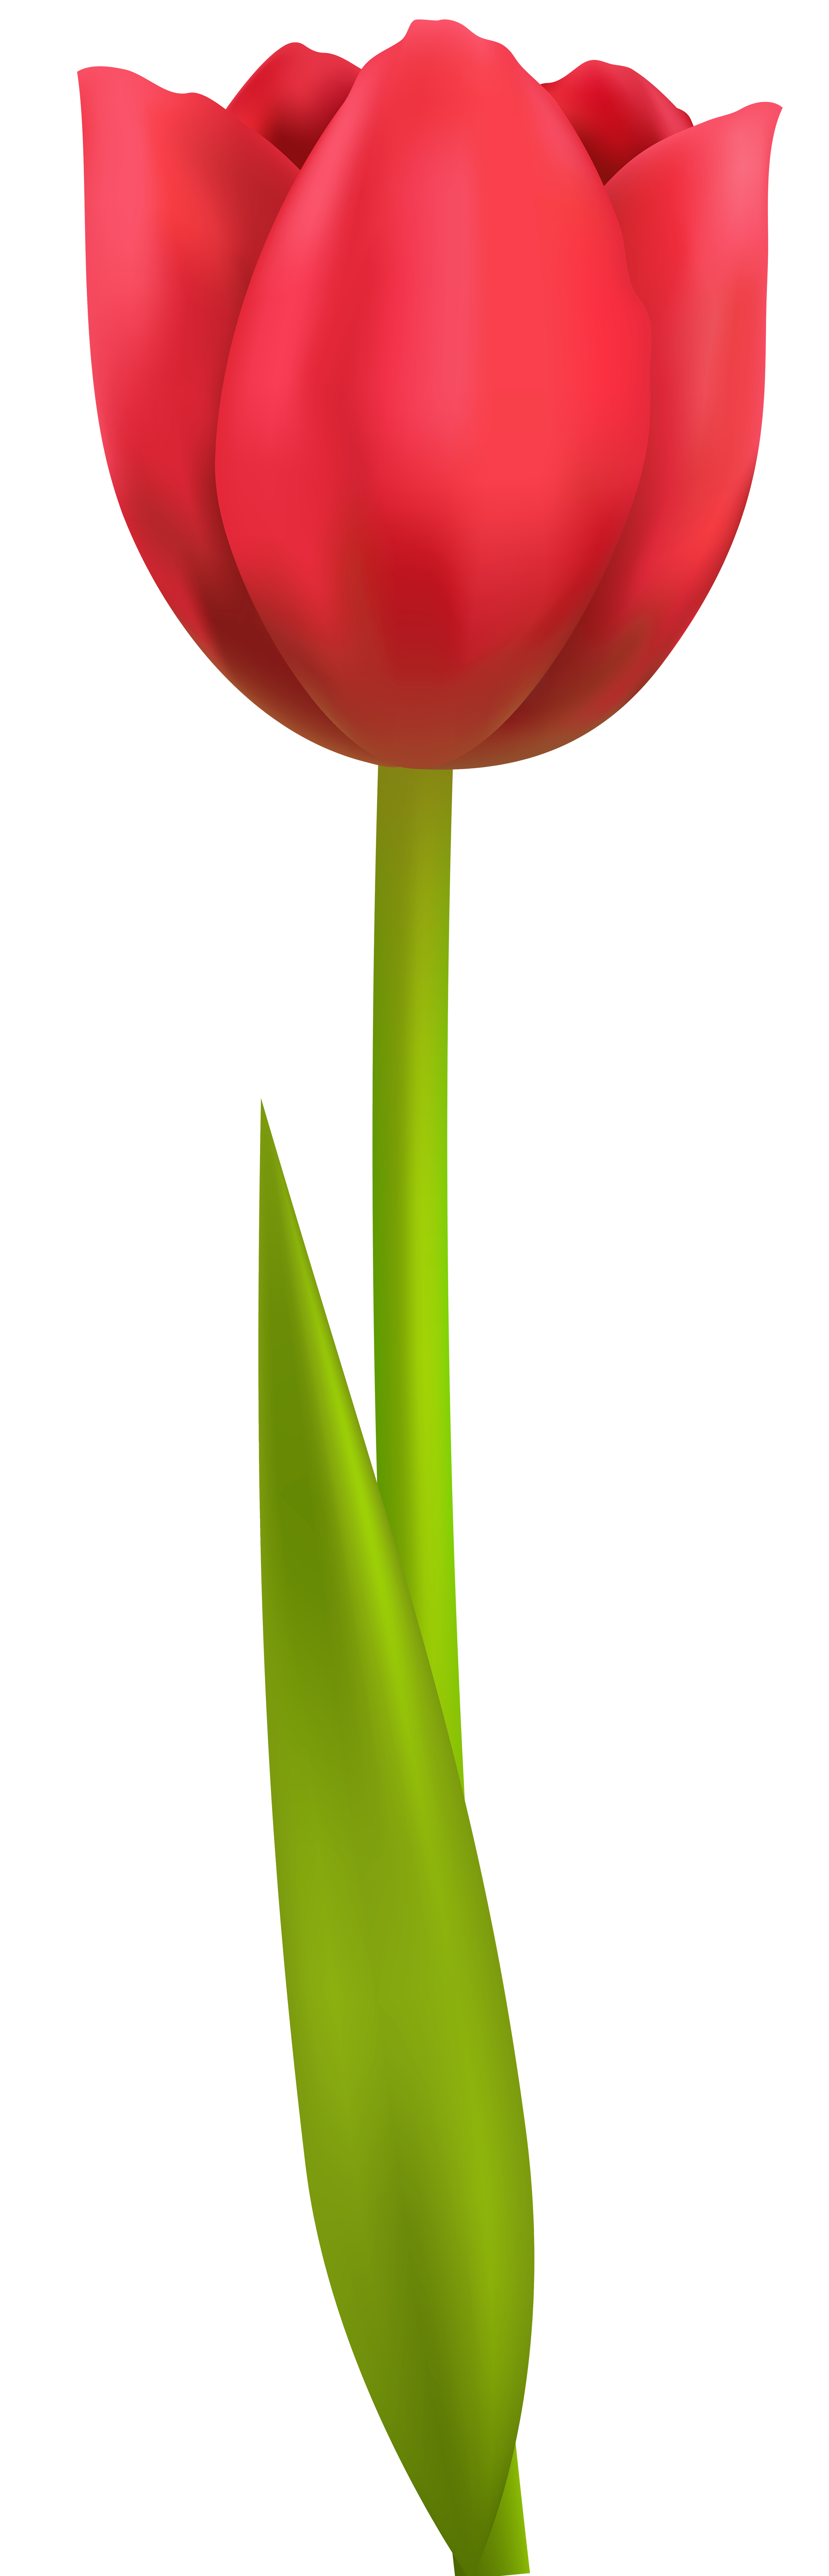 tulip png transparent clip art image tree arboles pinterest rh pinterest com tulip clipart black and white tulip clip art free